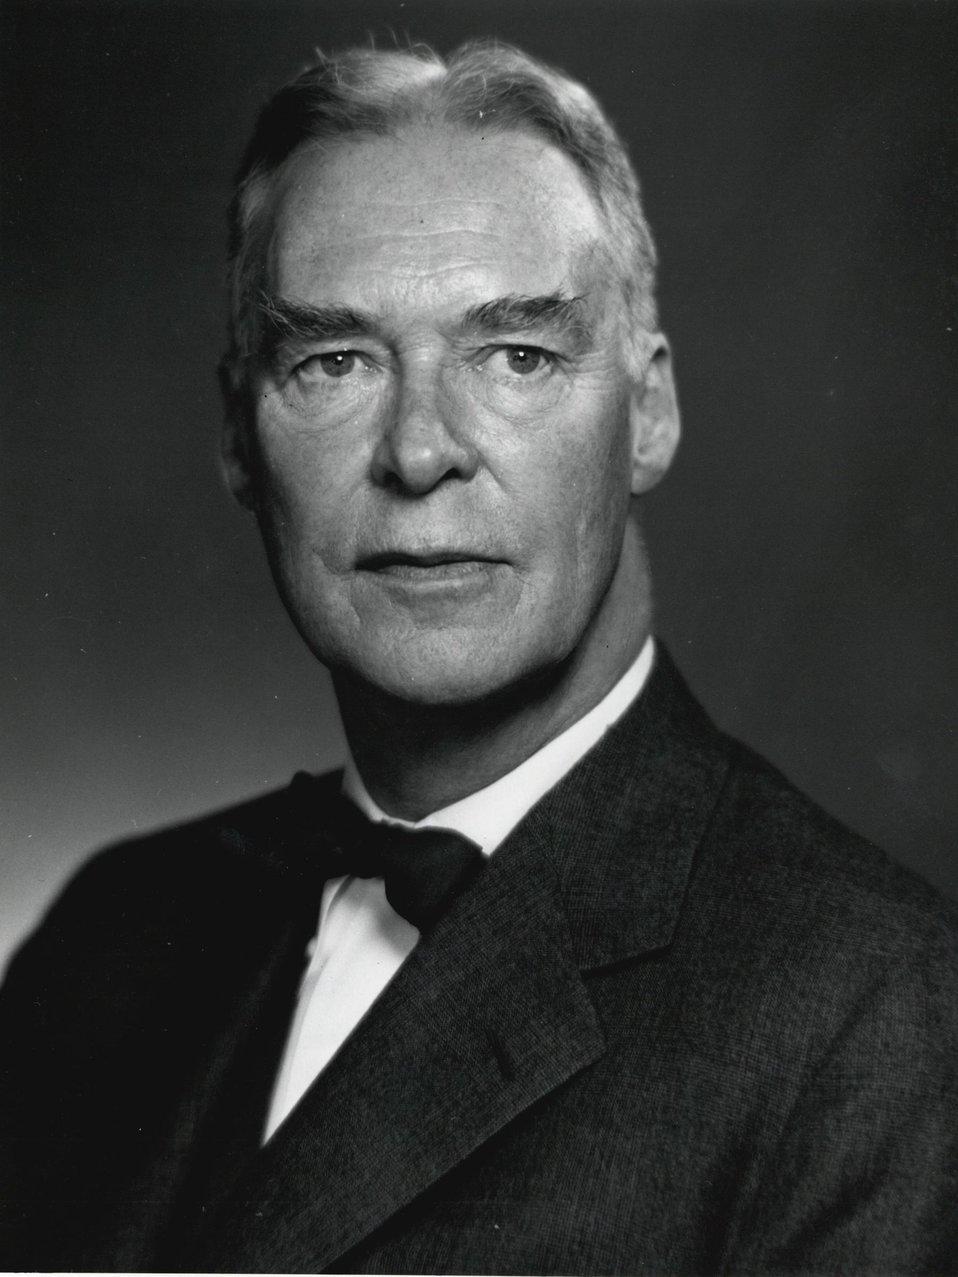 Christian A. Herter, U.S. Secretary of State